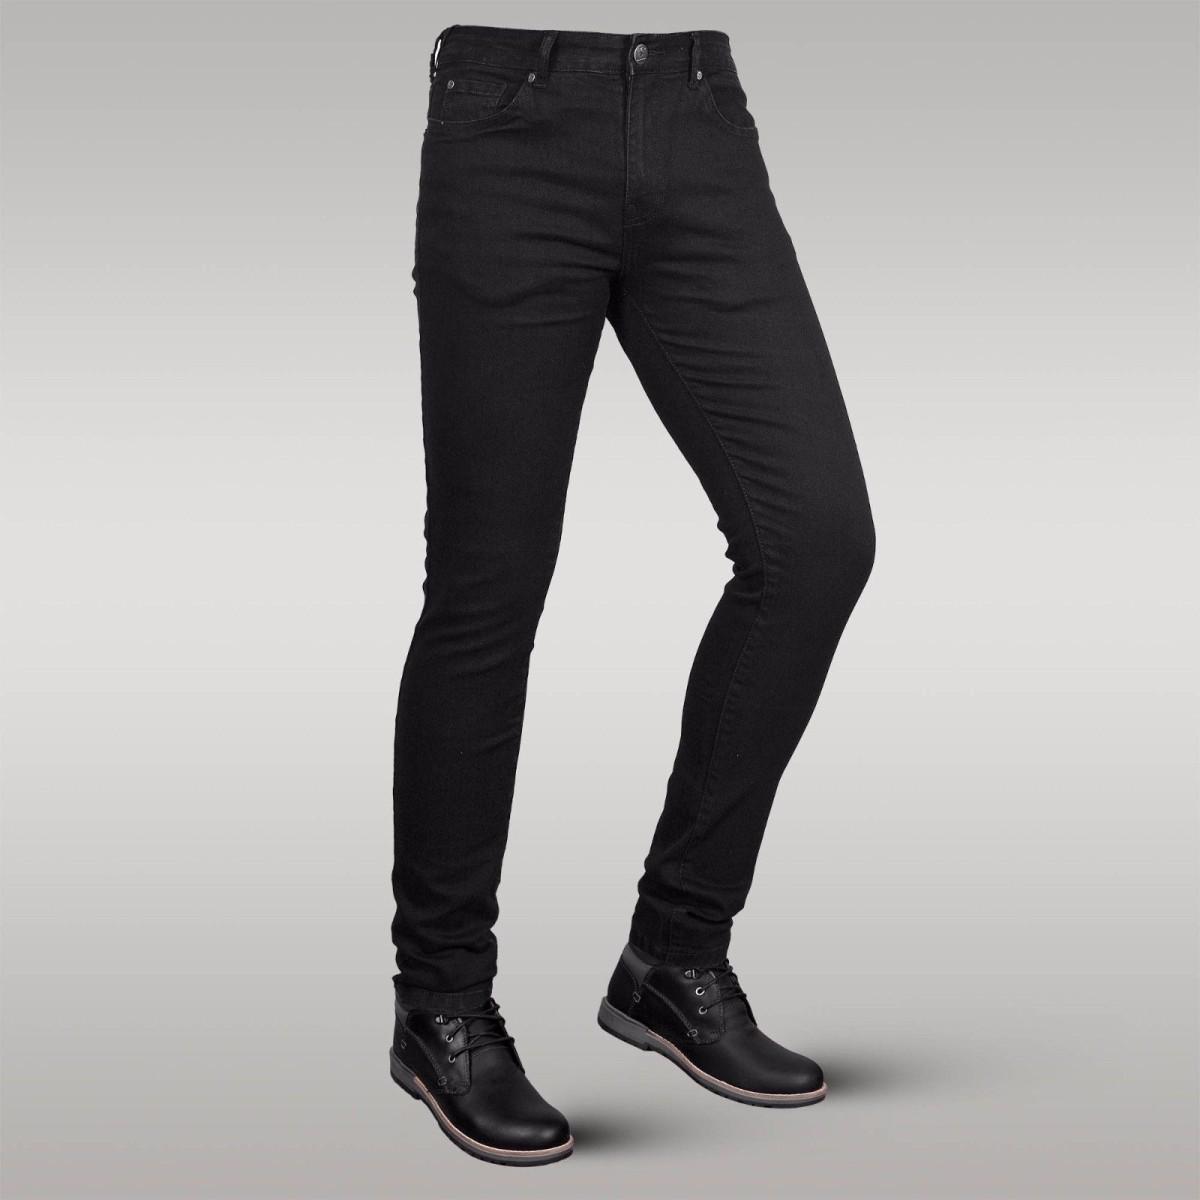 Steve Richard - Celana Jeans Panjang Pria / Skinny Jeans / Jeans Hitam / celana Panjang Jeans Hitam / Jeans Hitam / Black Skinny Jeans / Celana Denim Hitam ...